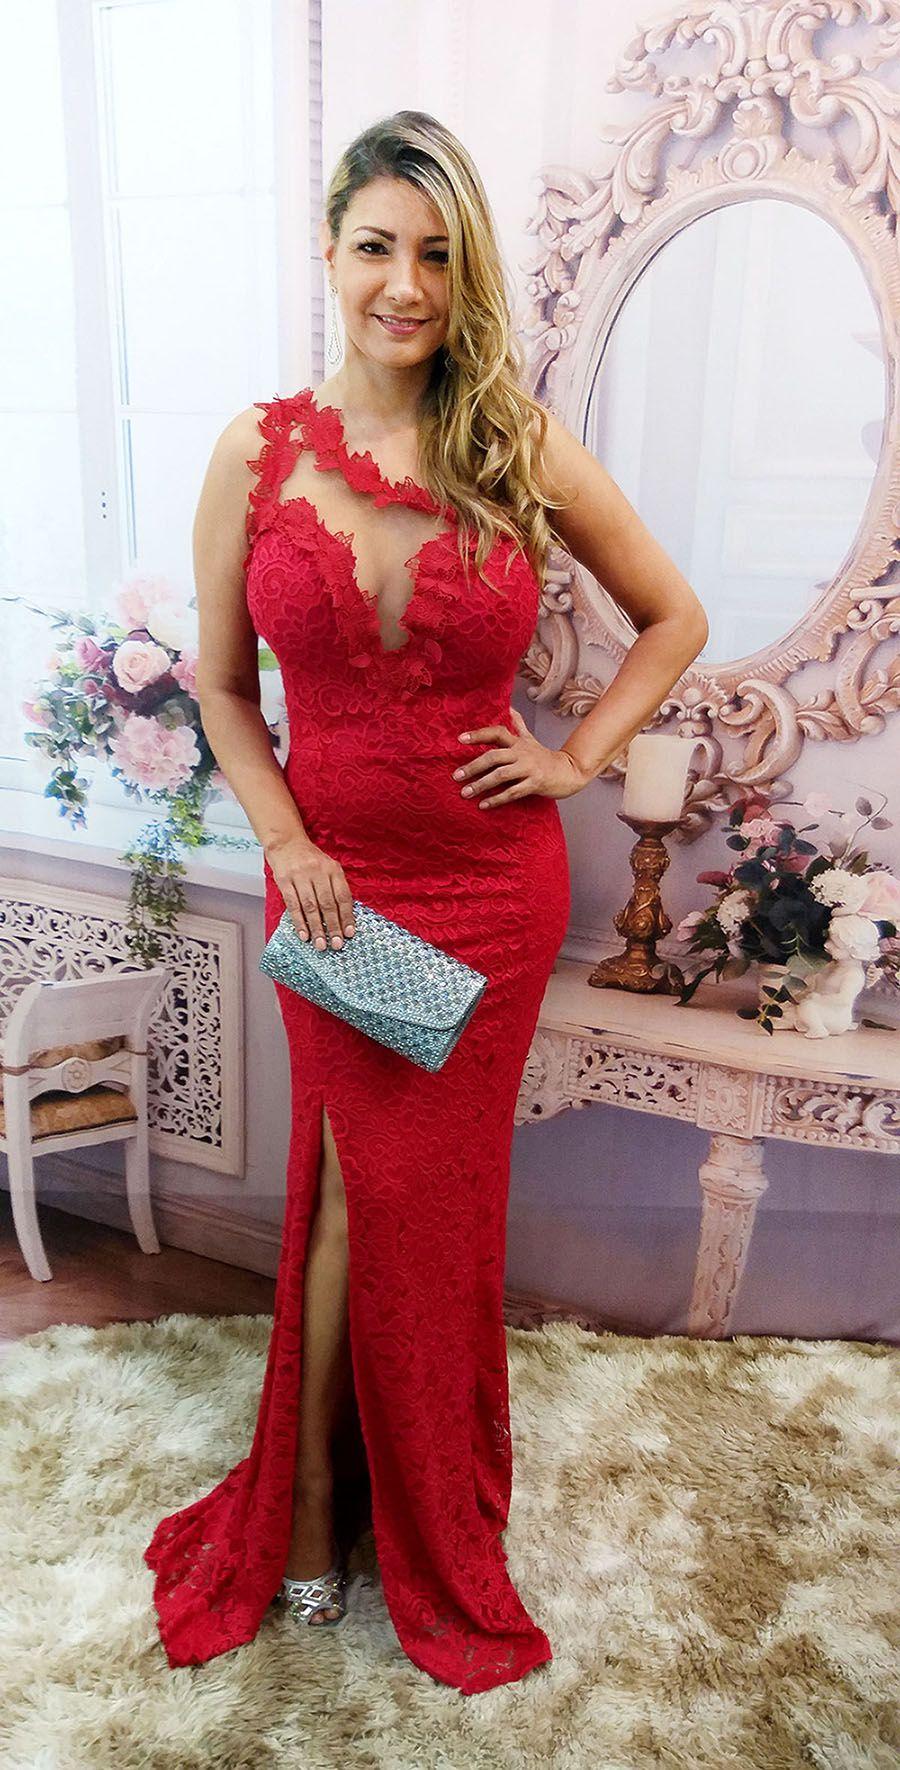 8bdfacb8b ... Vestido de Festa Renda Vermelho - Fenda